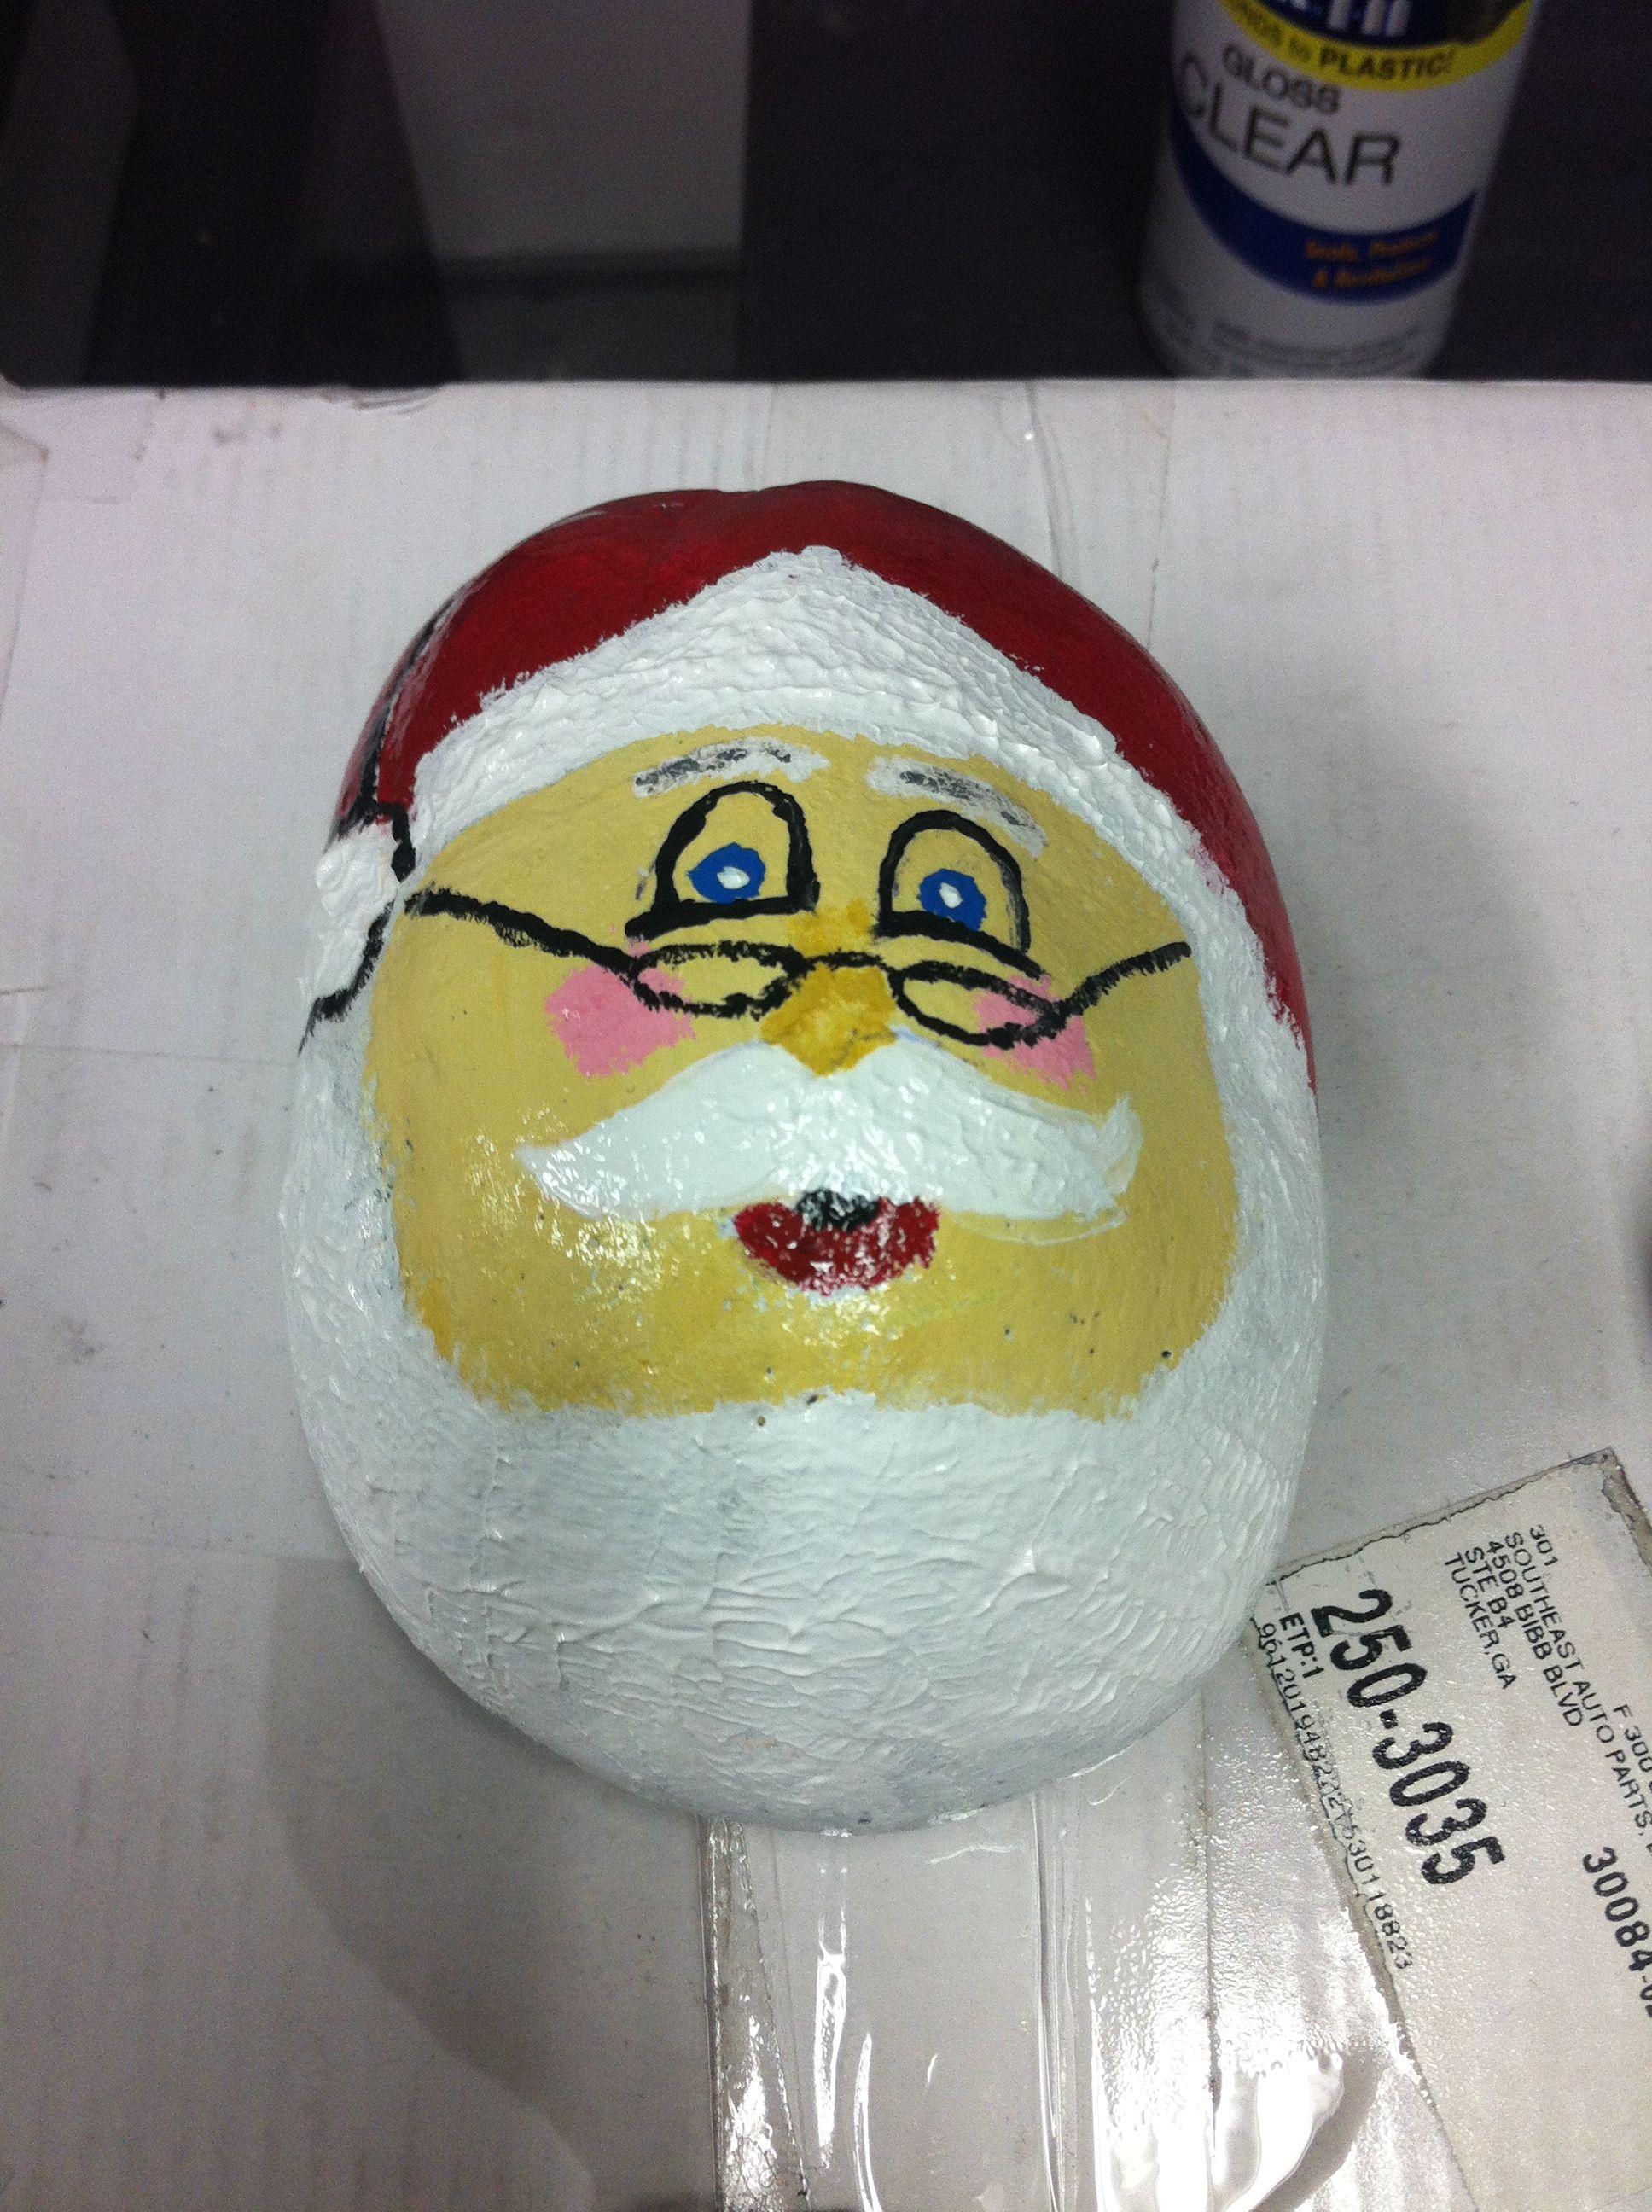 Painted rock: Santa Claus